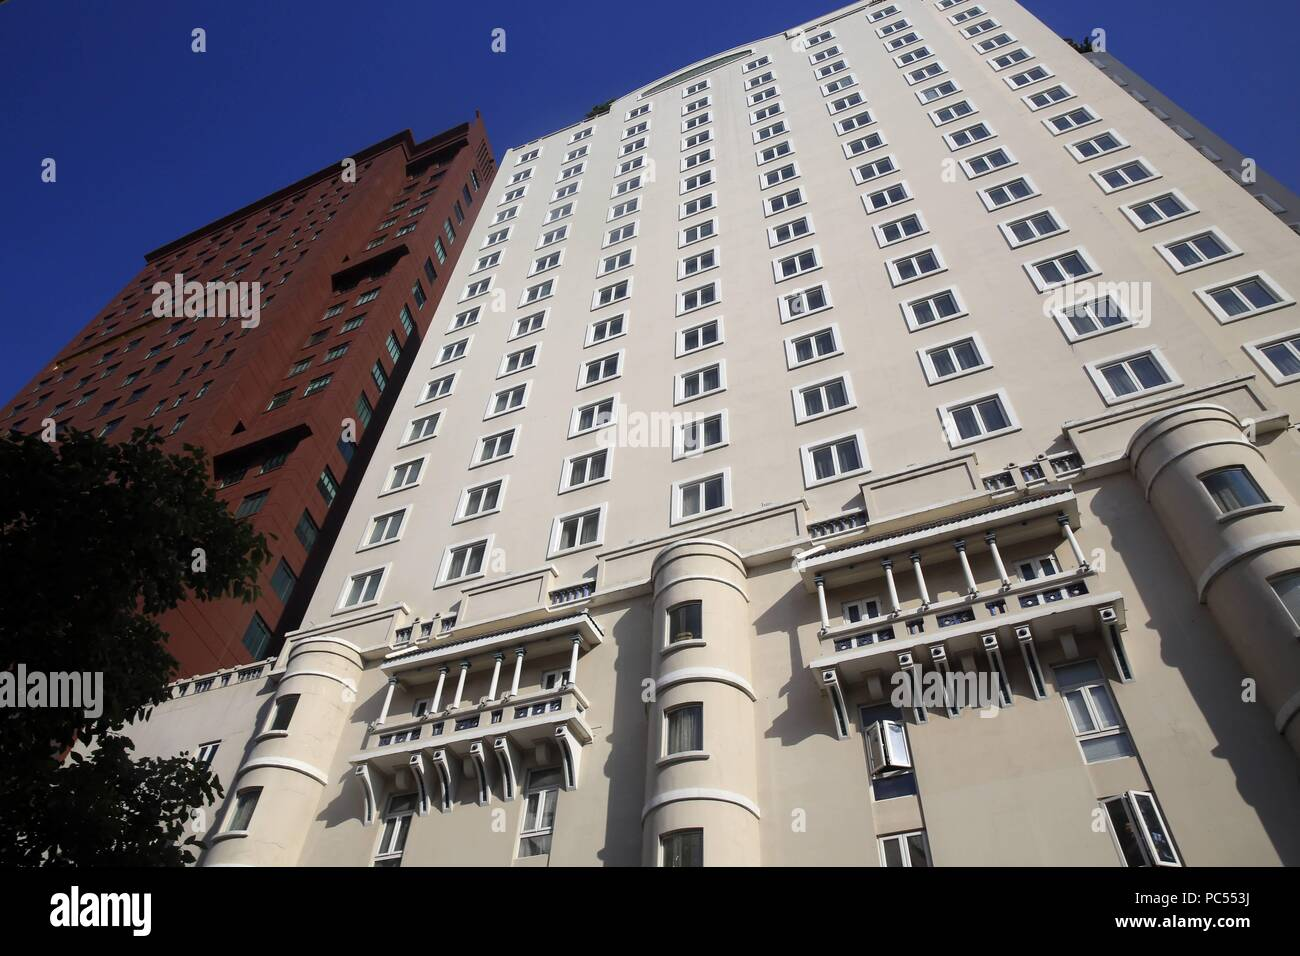 Grand Hotel Saigon Ho Chi Minh City Vietnam Usage Worldwide